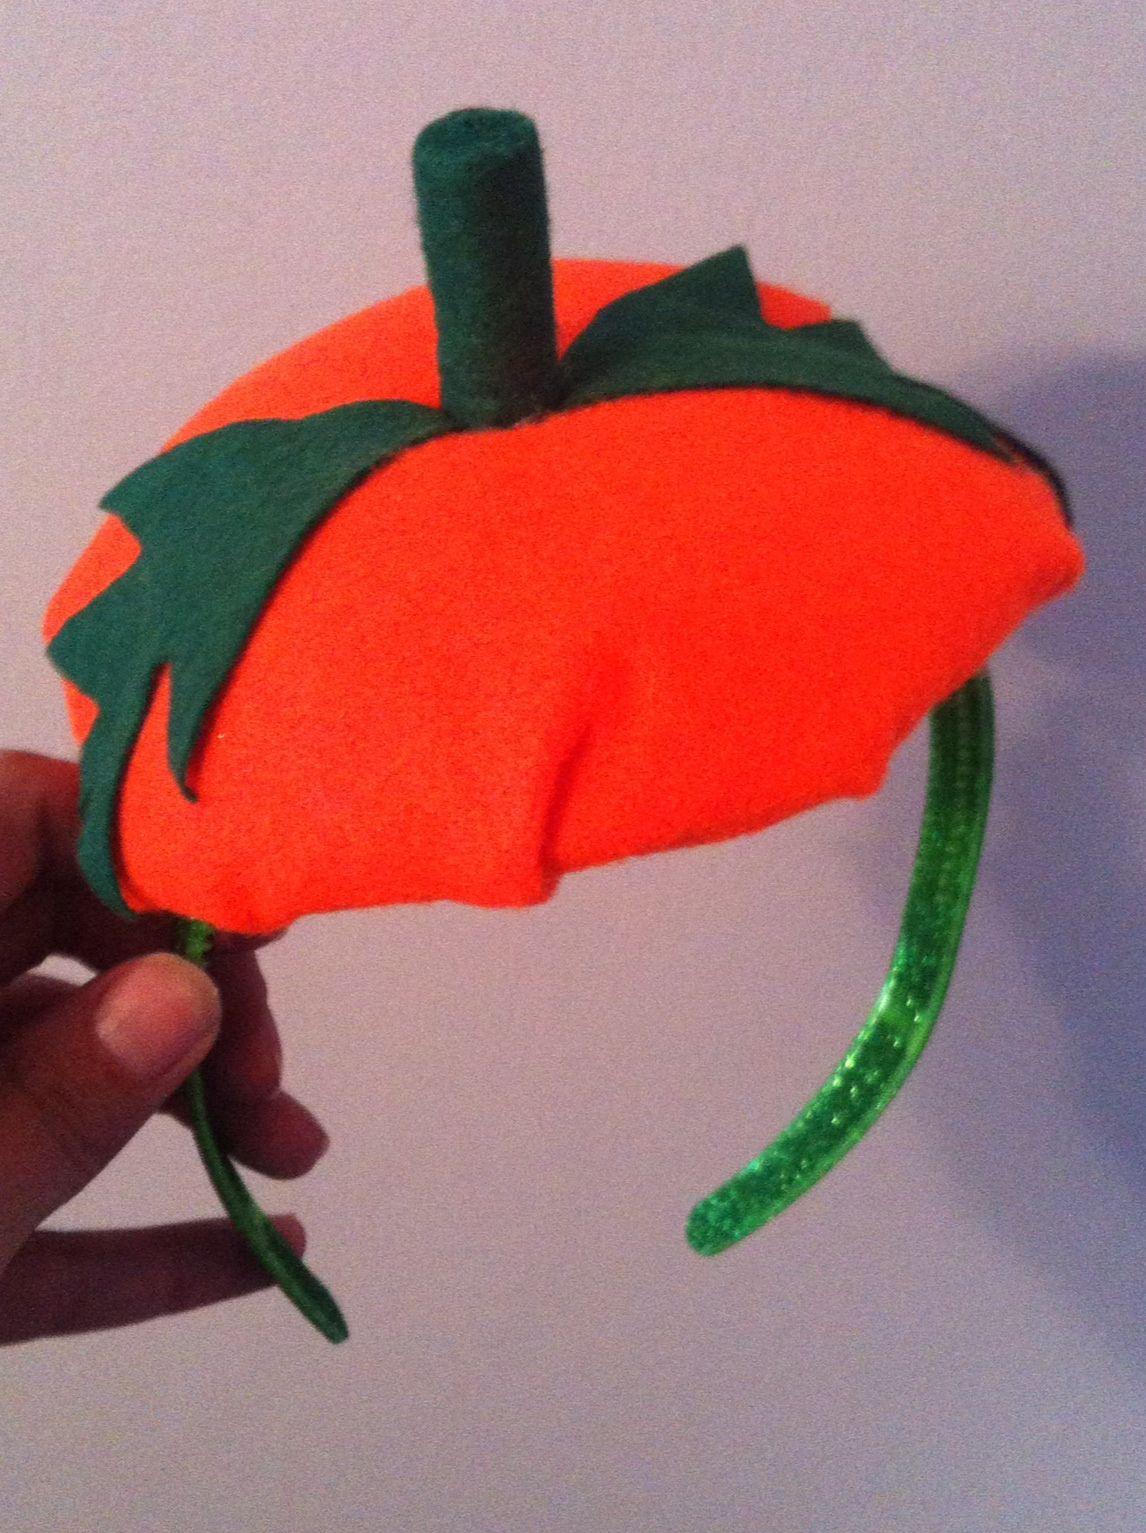 DIY pumpkin head band for Halloween/ costume accessory